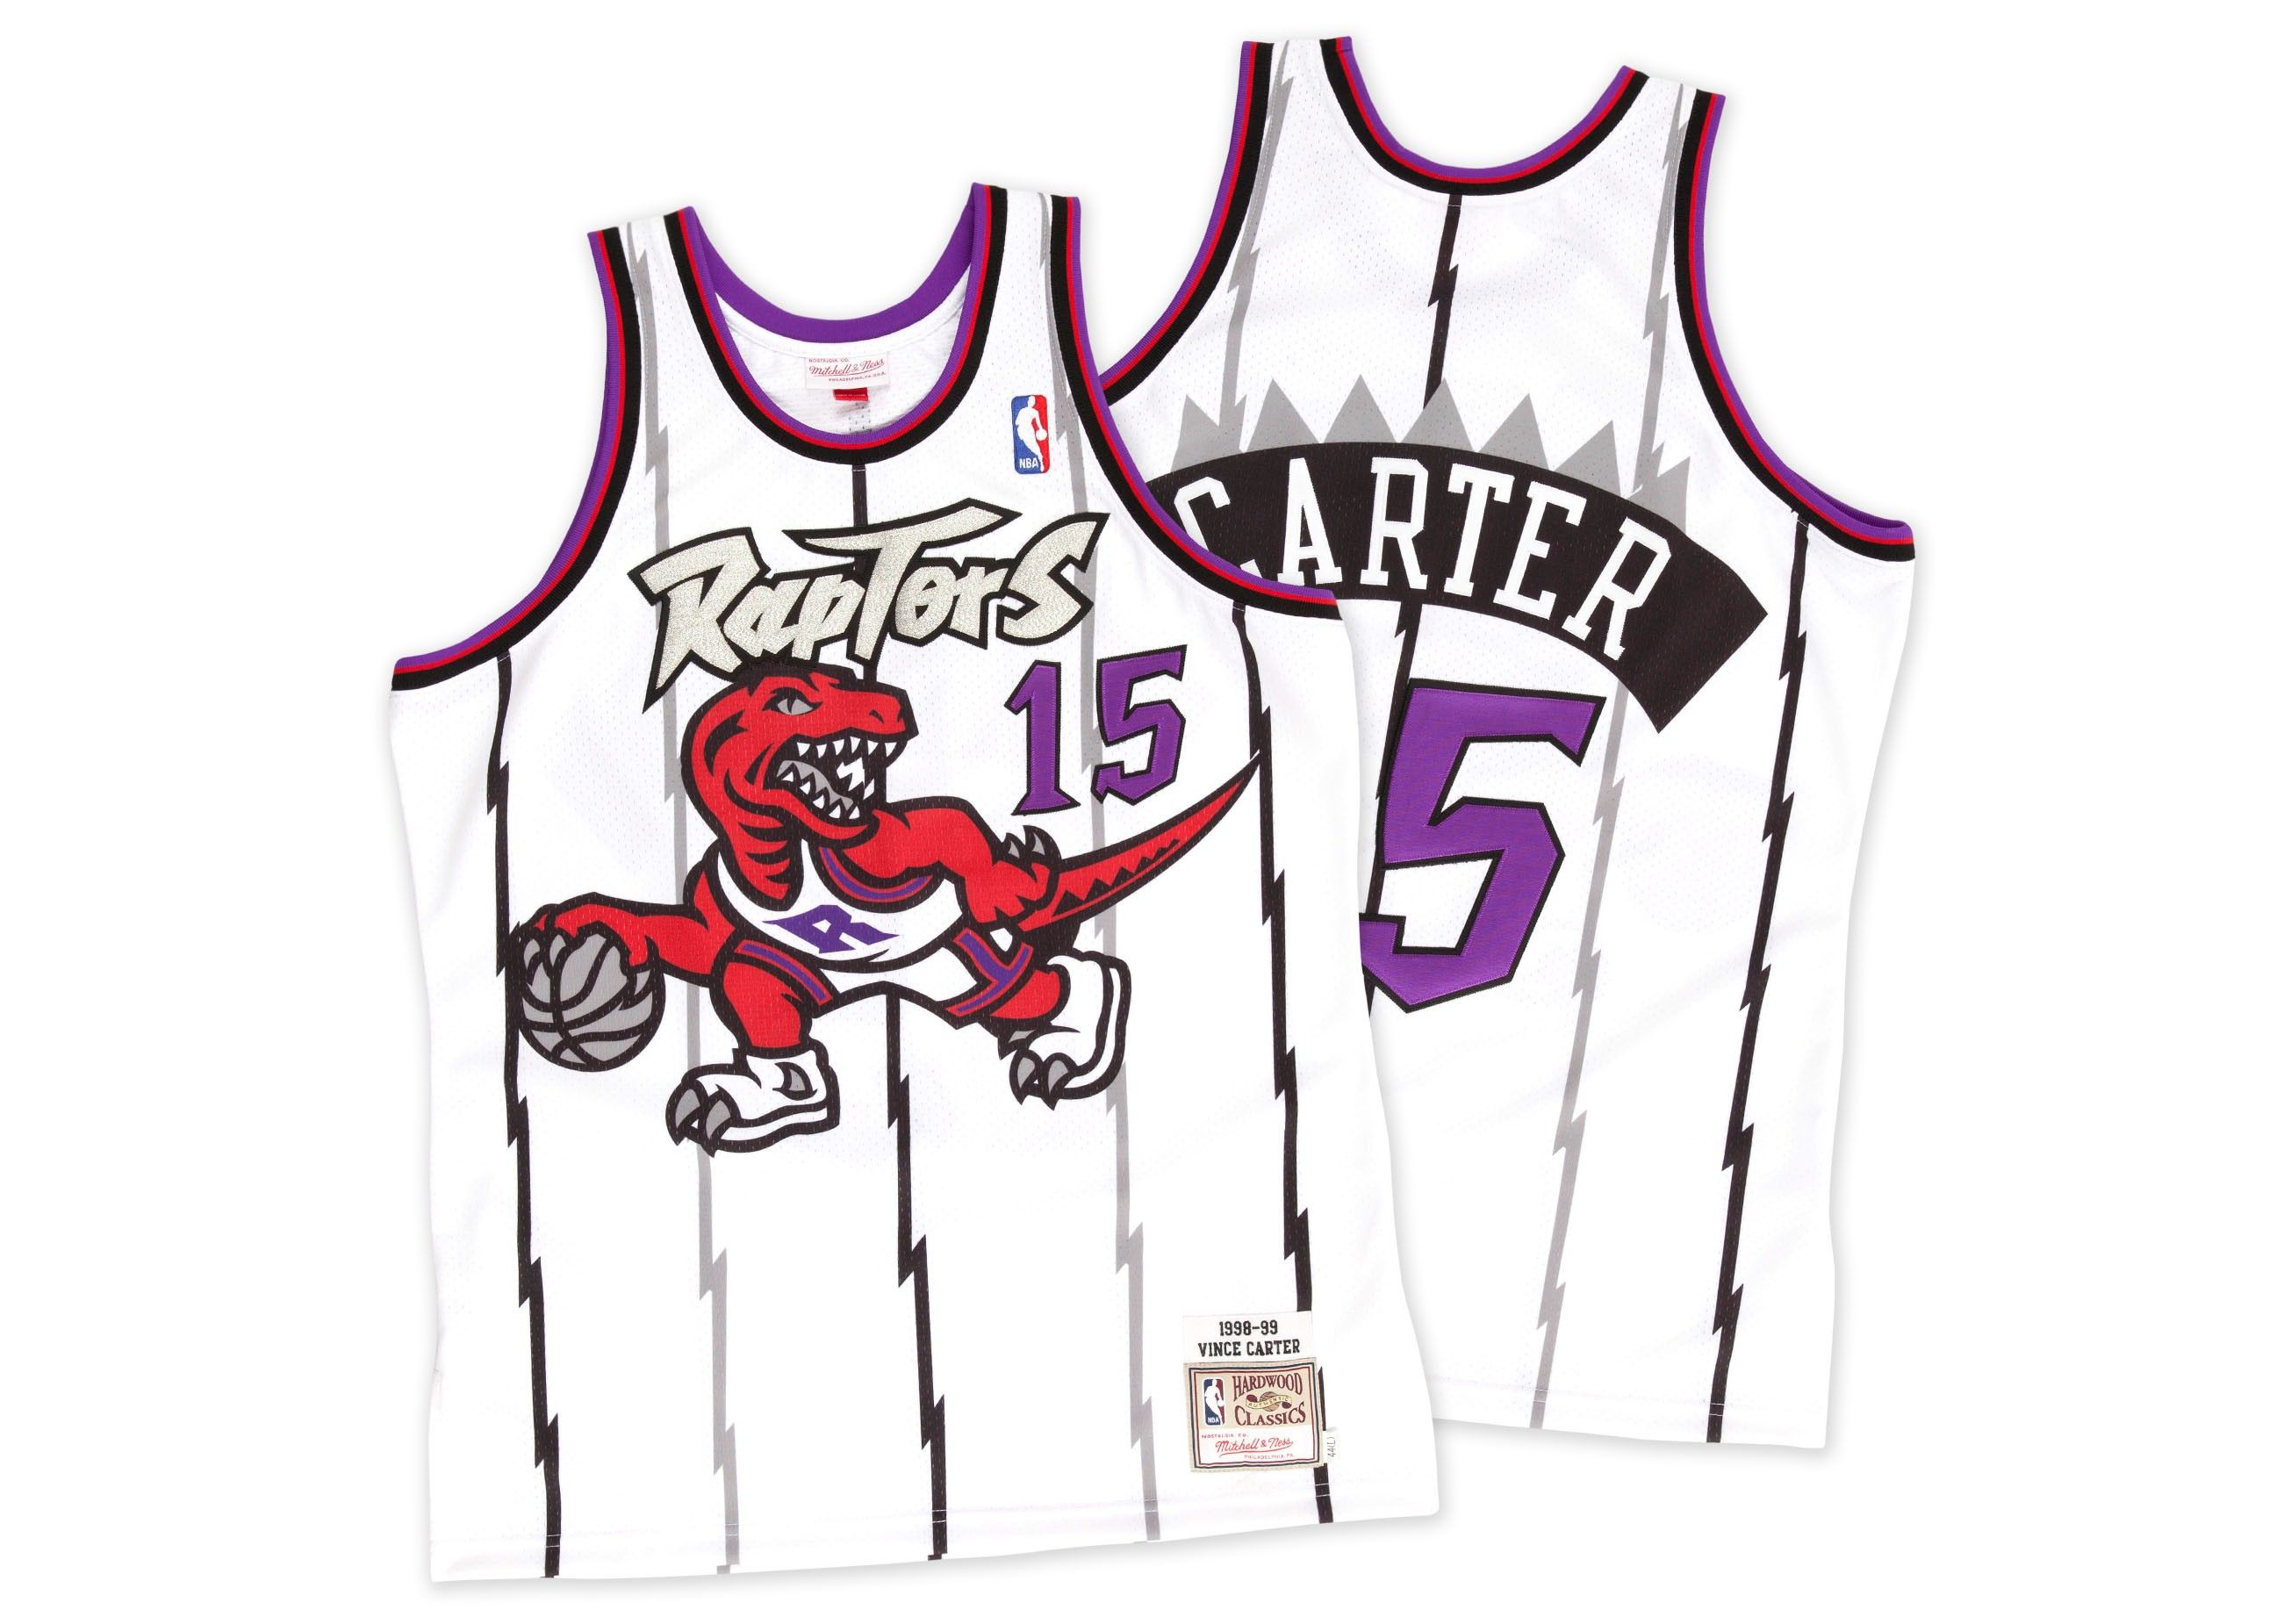 6b74dedccbb ... 15 Pride Vince Carter 1998-99 Authentic Jersey Toronto Raptors -  Mitchell Ness ...